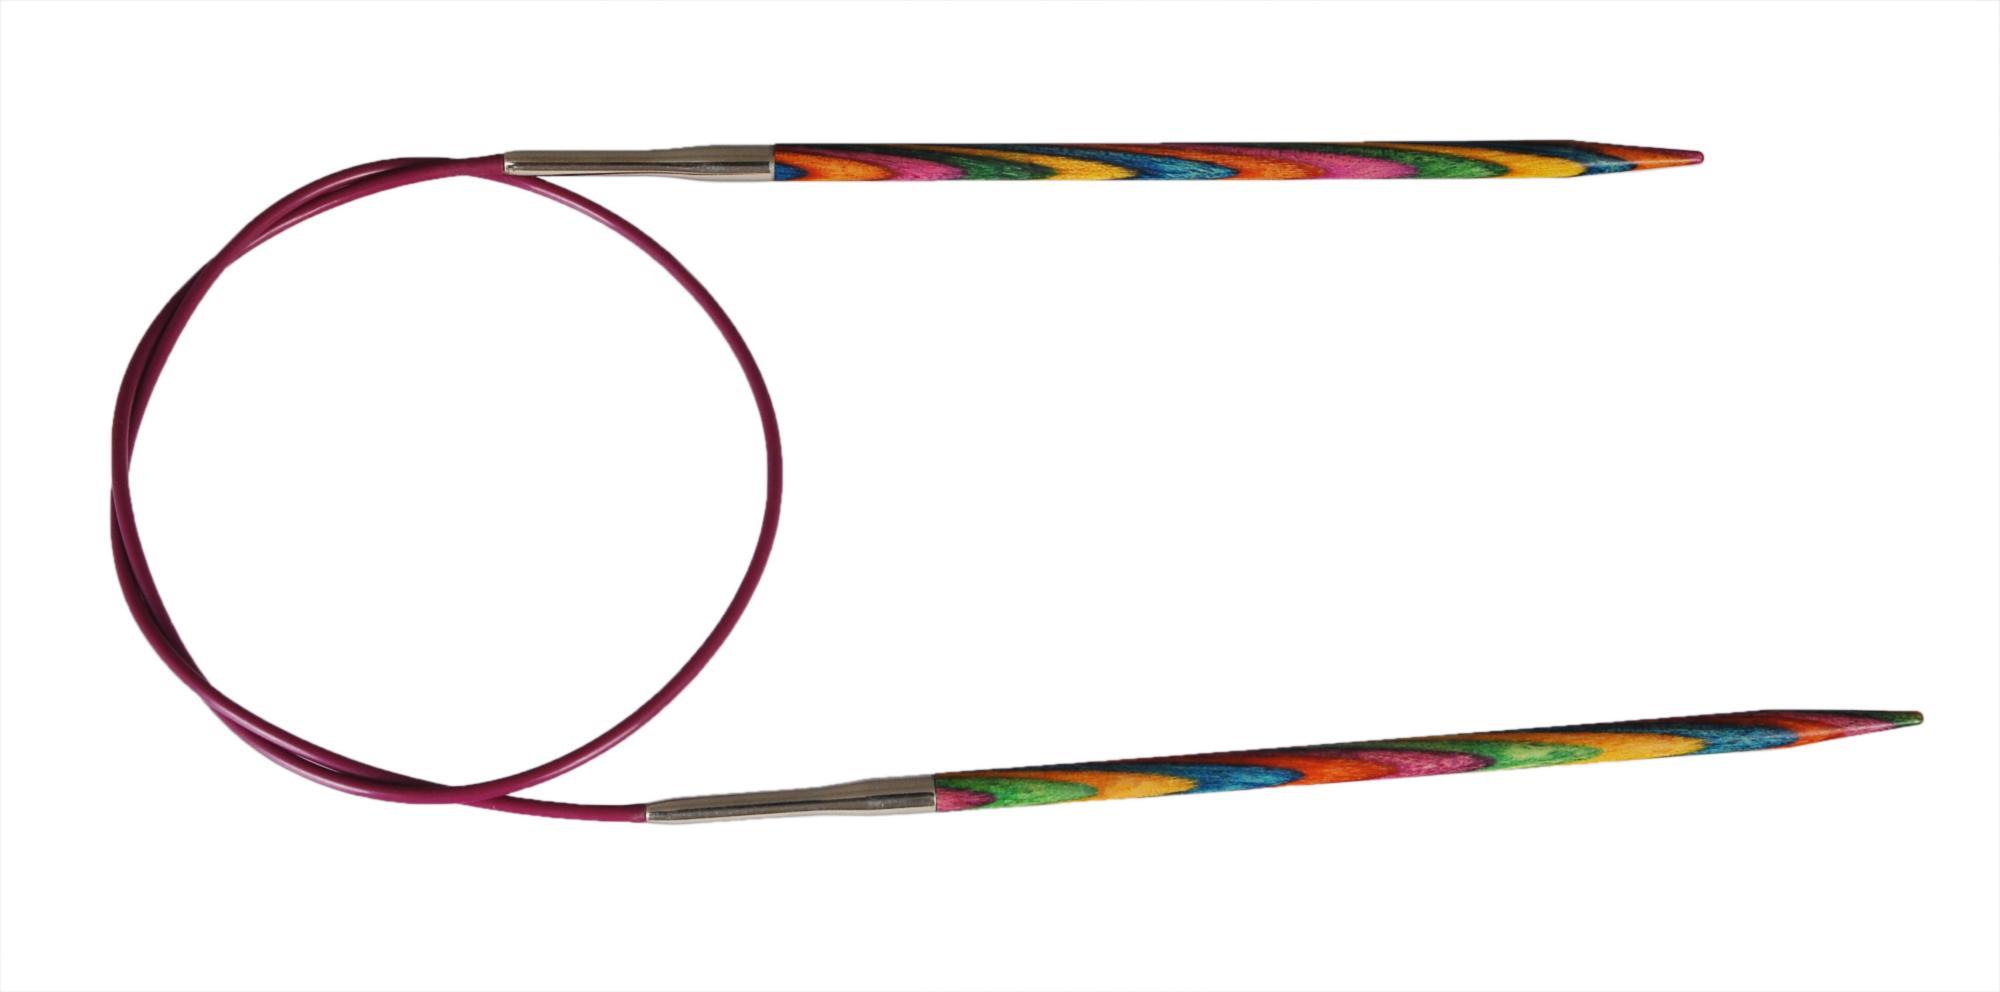 Спицы круговые 150 см Symfonie Wood KnitPro, 20515, 3.00 мм